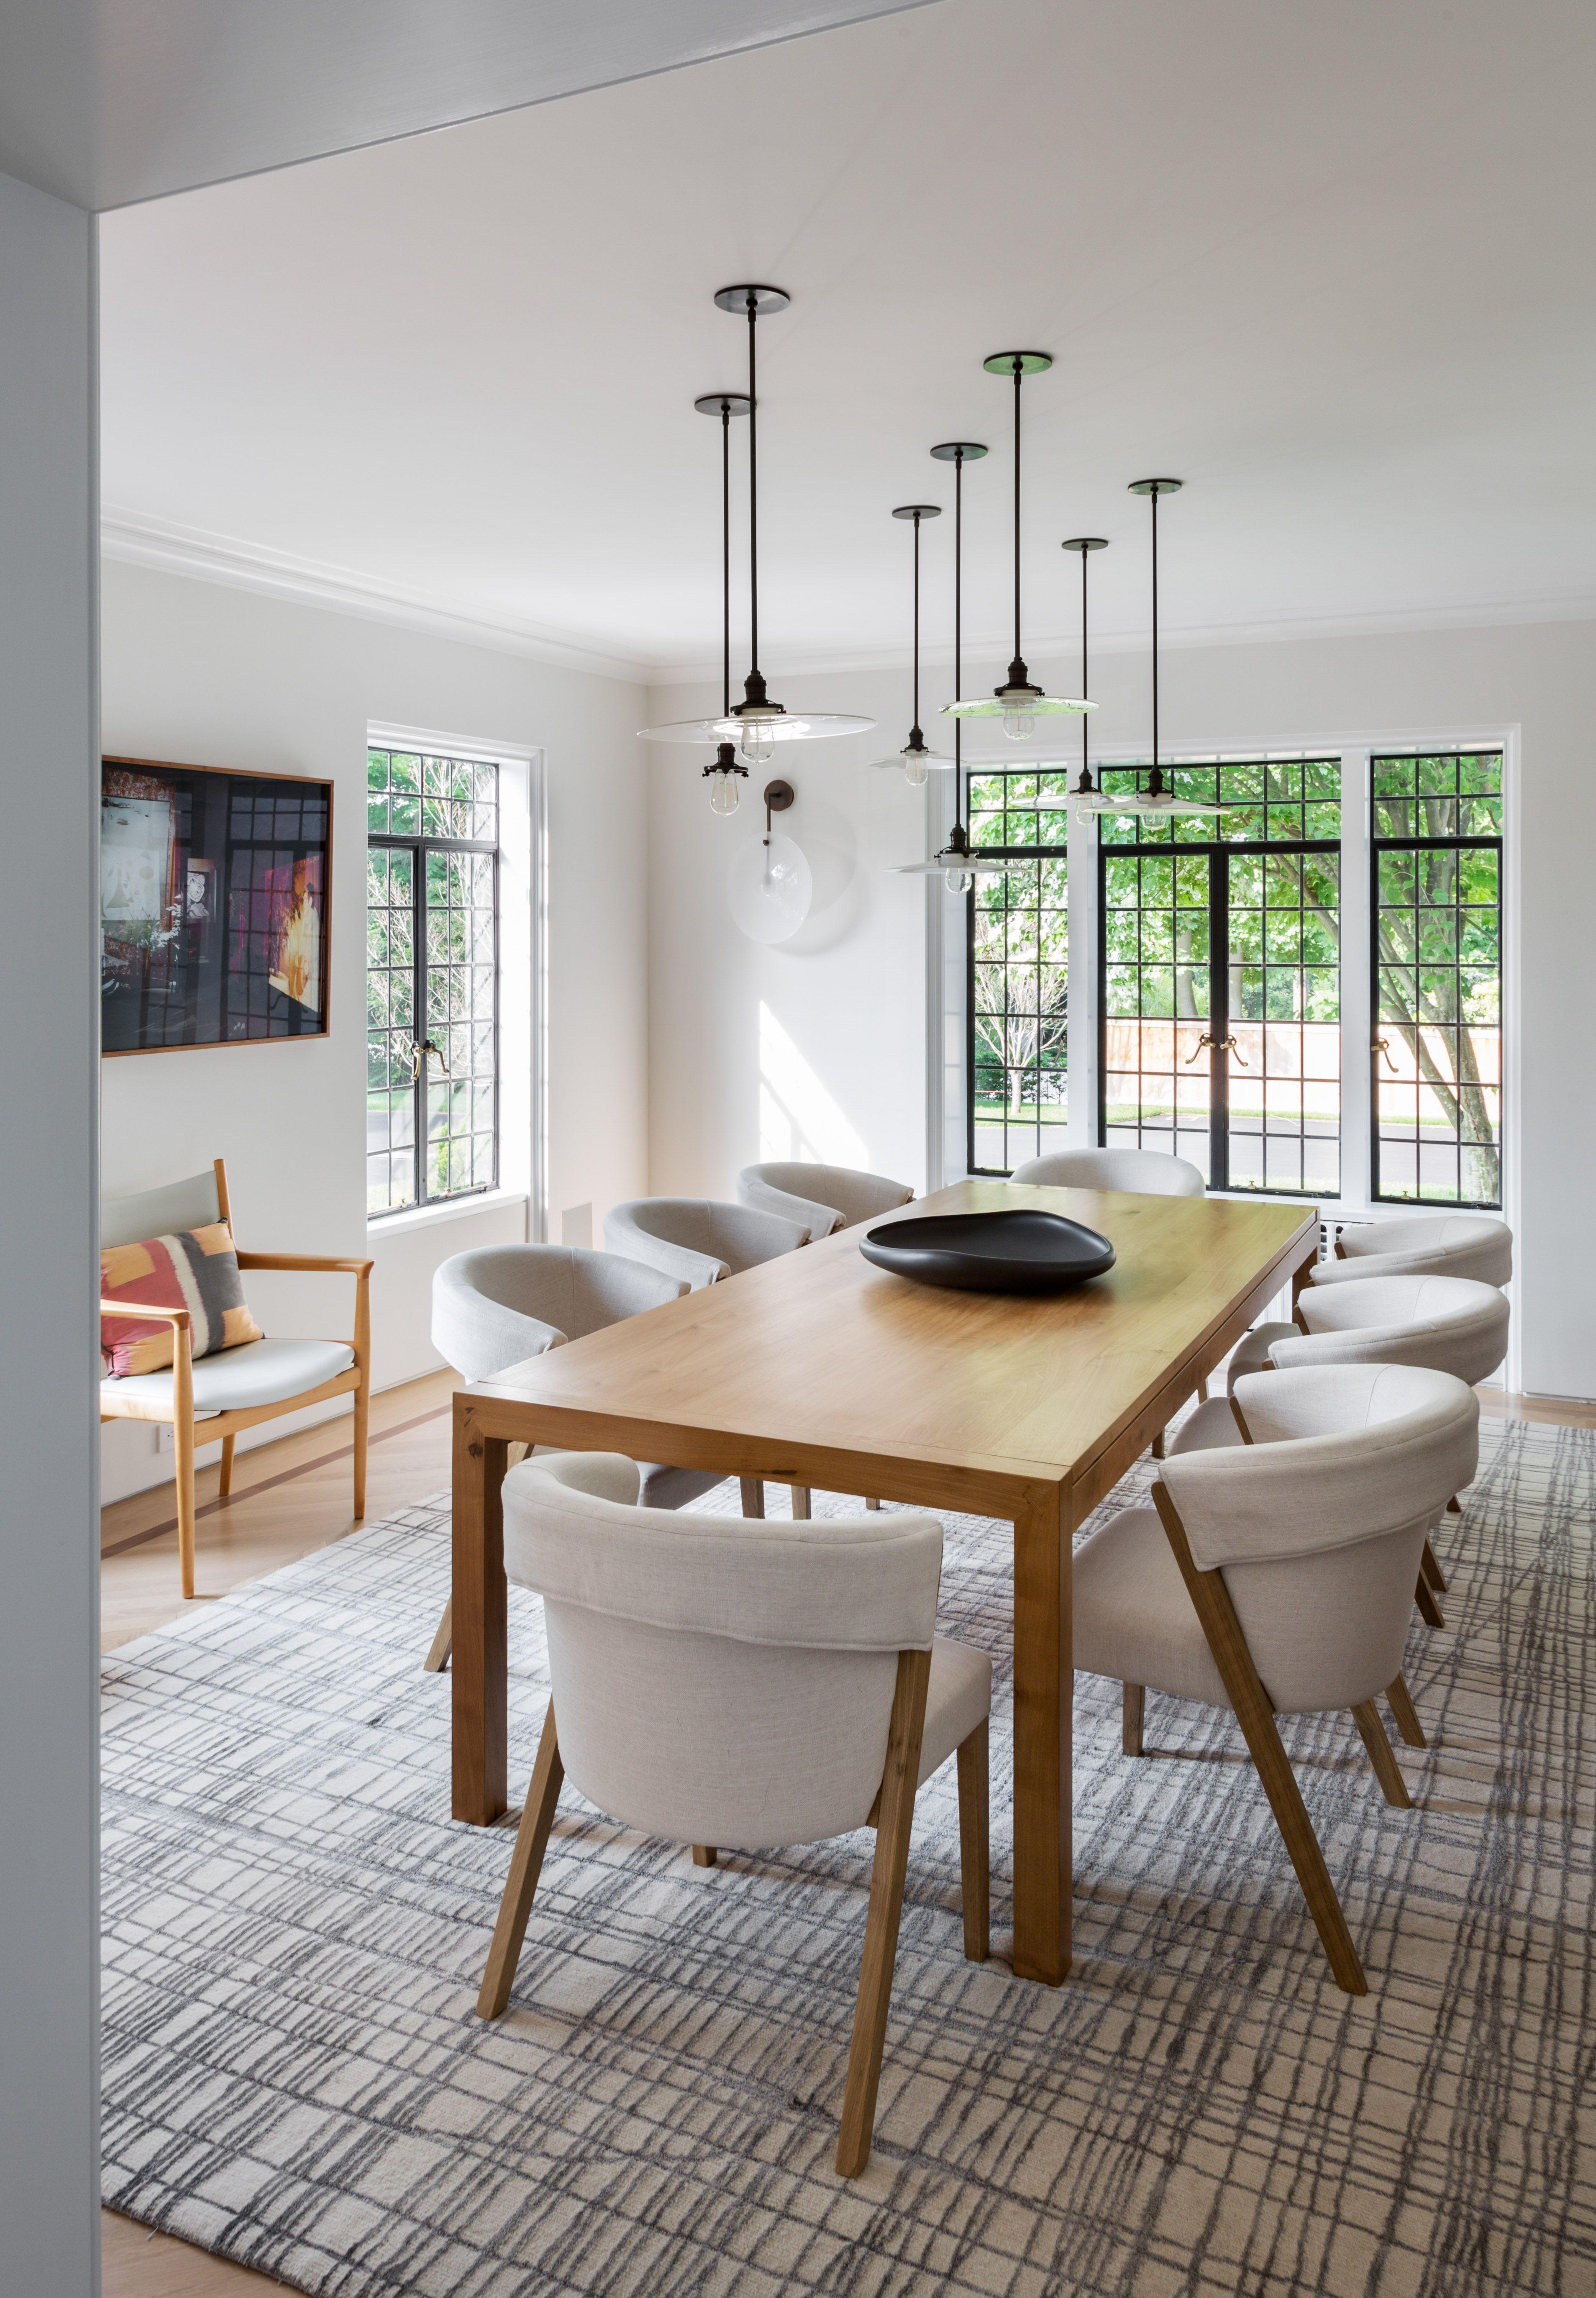 Minimalist Dining Rooms That Are Far, Minimalist Dining Room Table